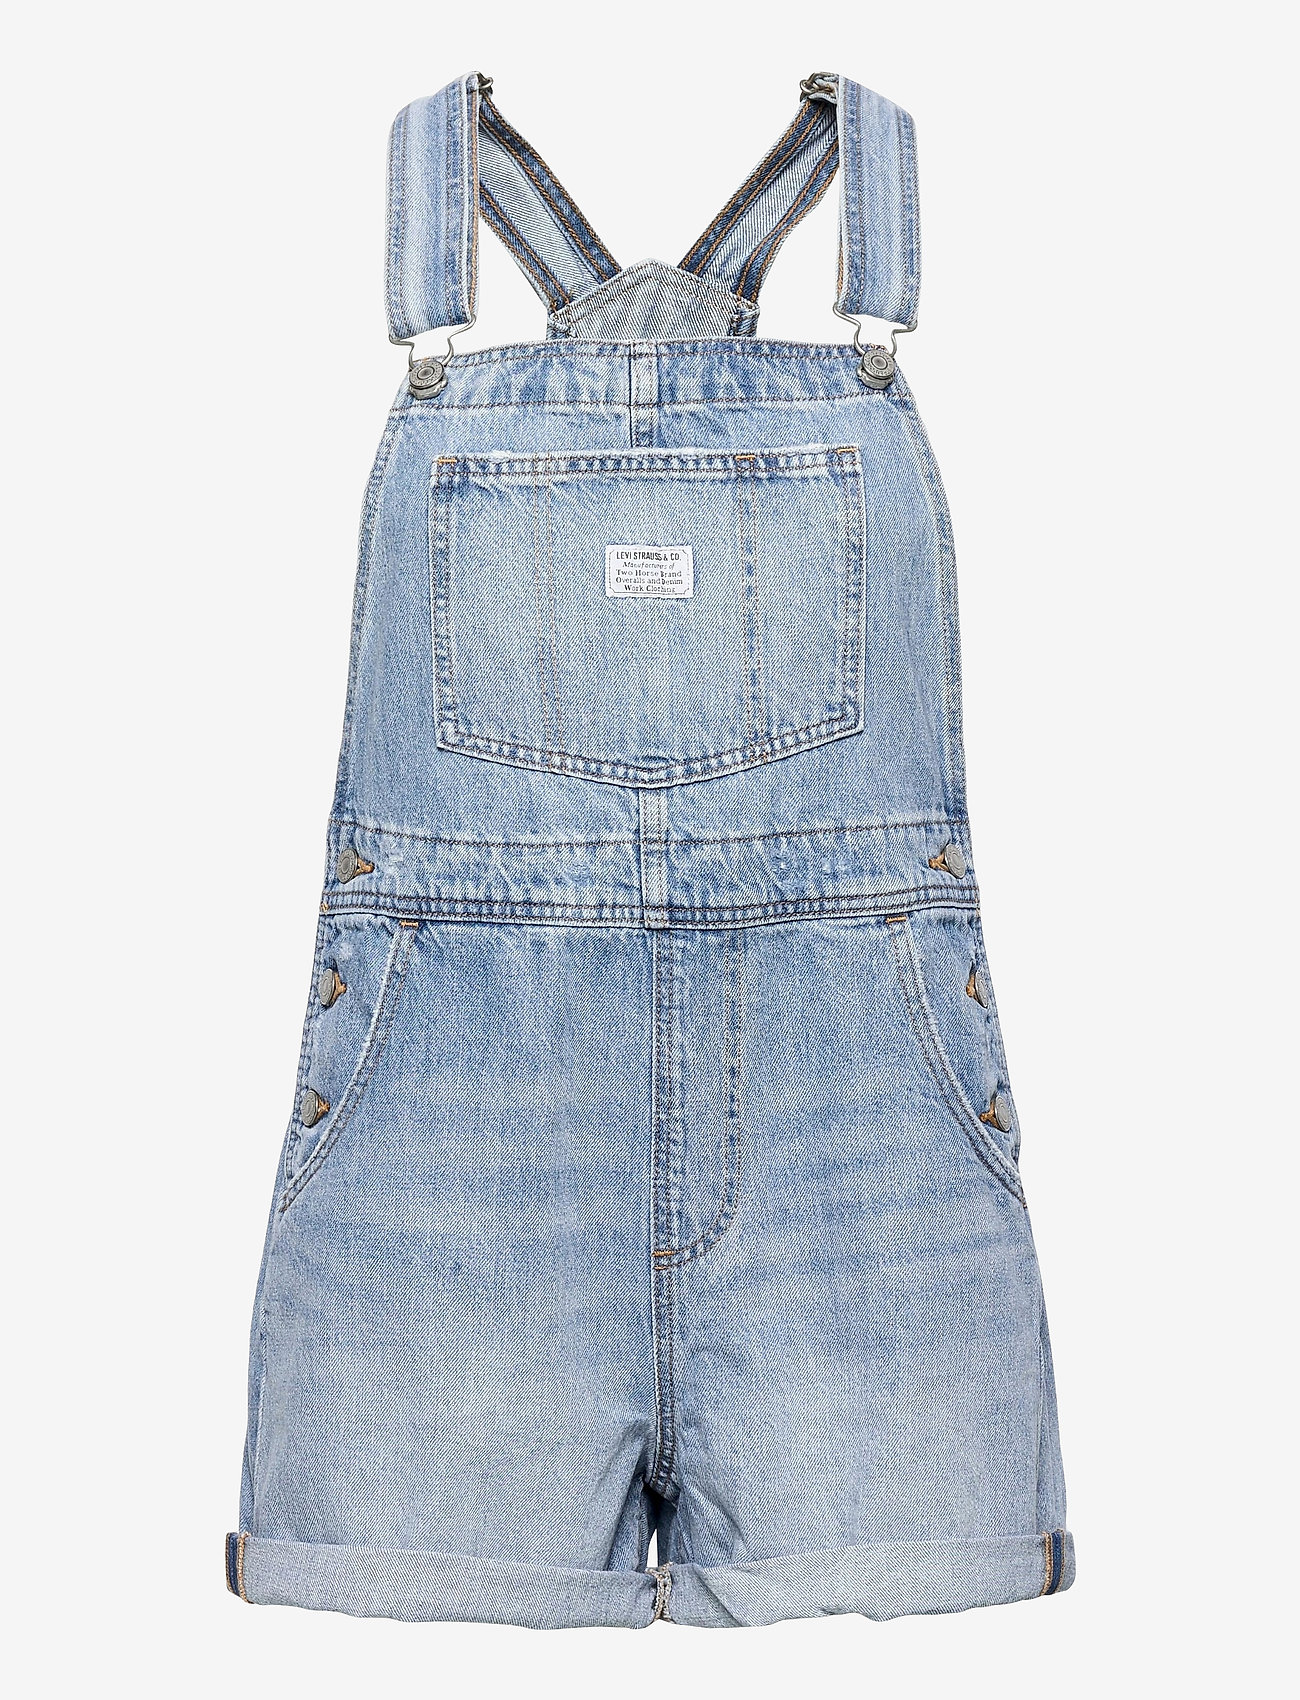 LEVI´S Women - VINTAGE SHORTALL OPEN SKIES - tøj - med indigo - worn in - 0